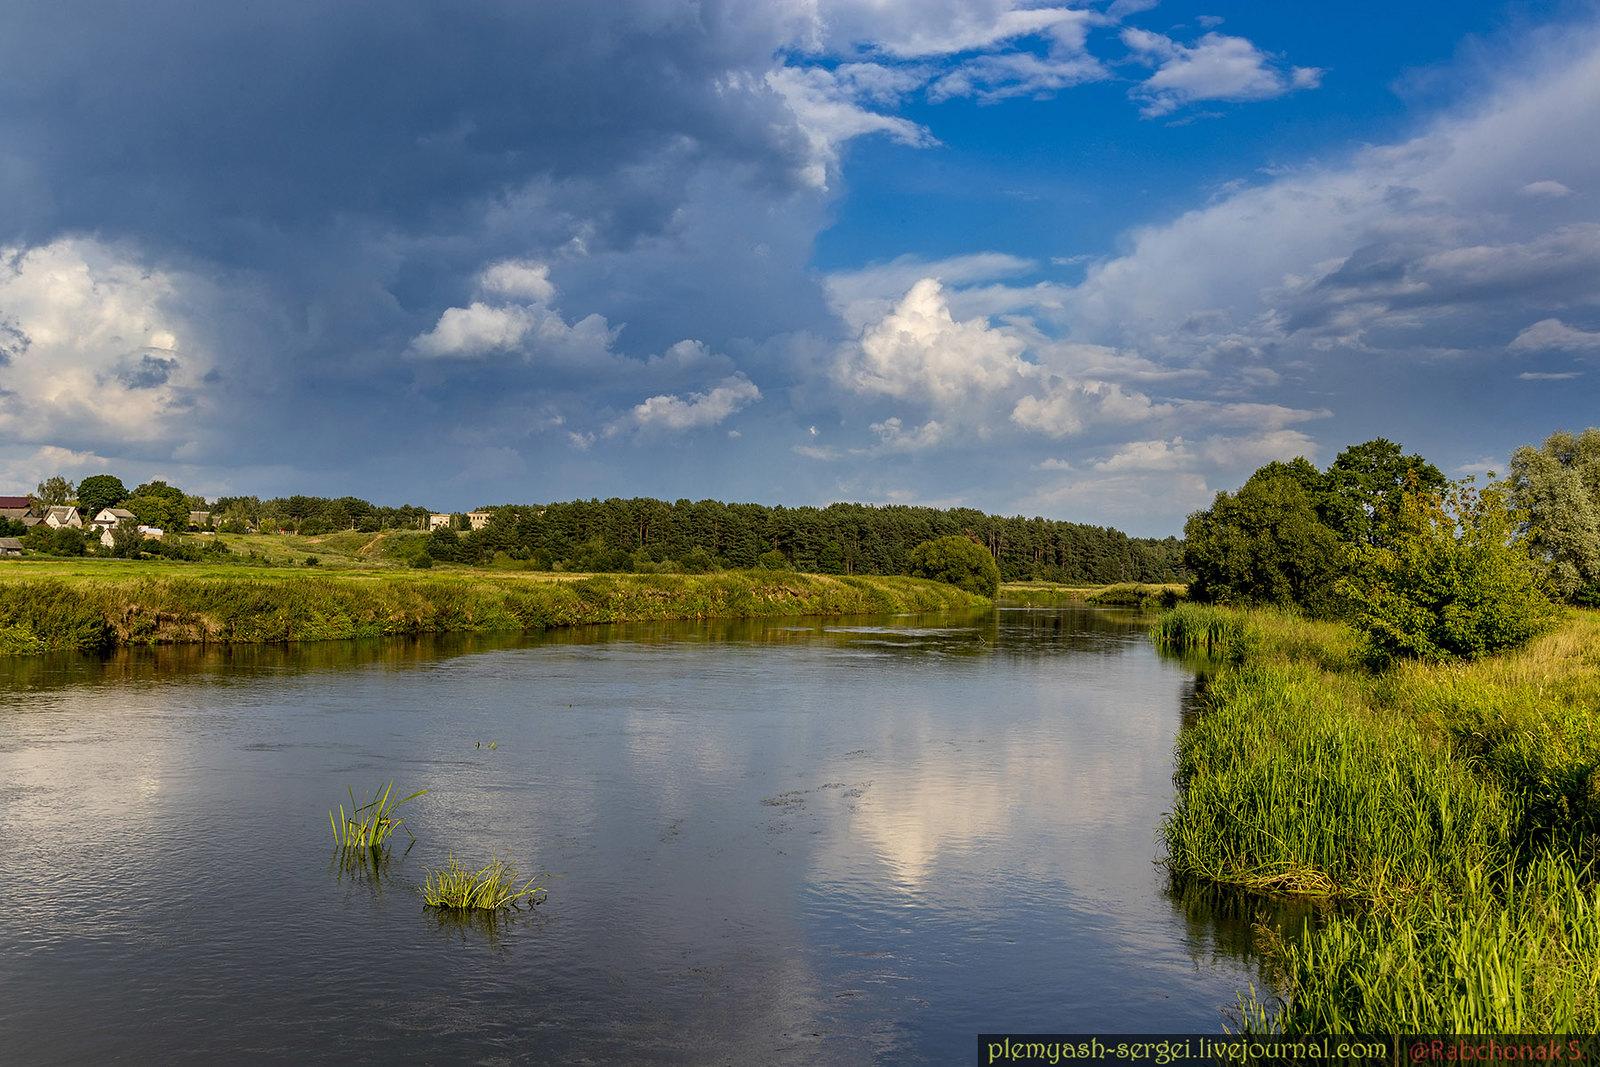 The river in Belarus